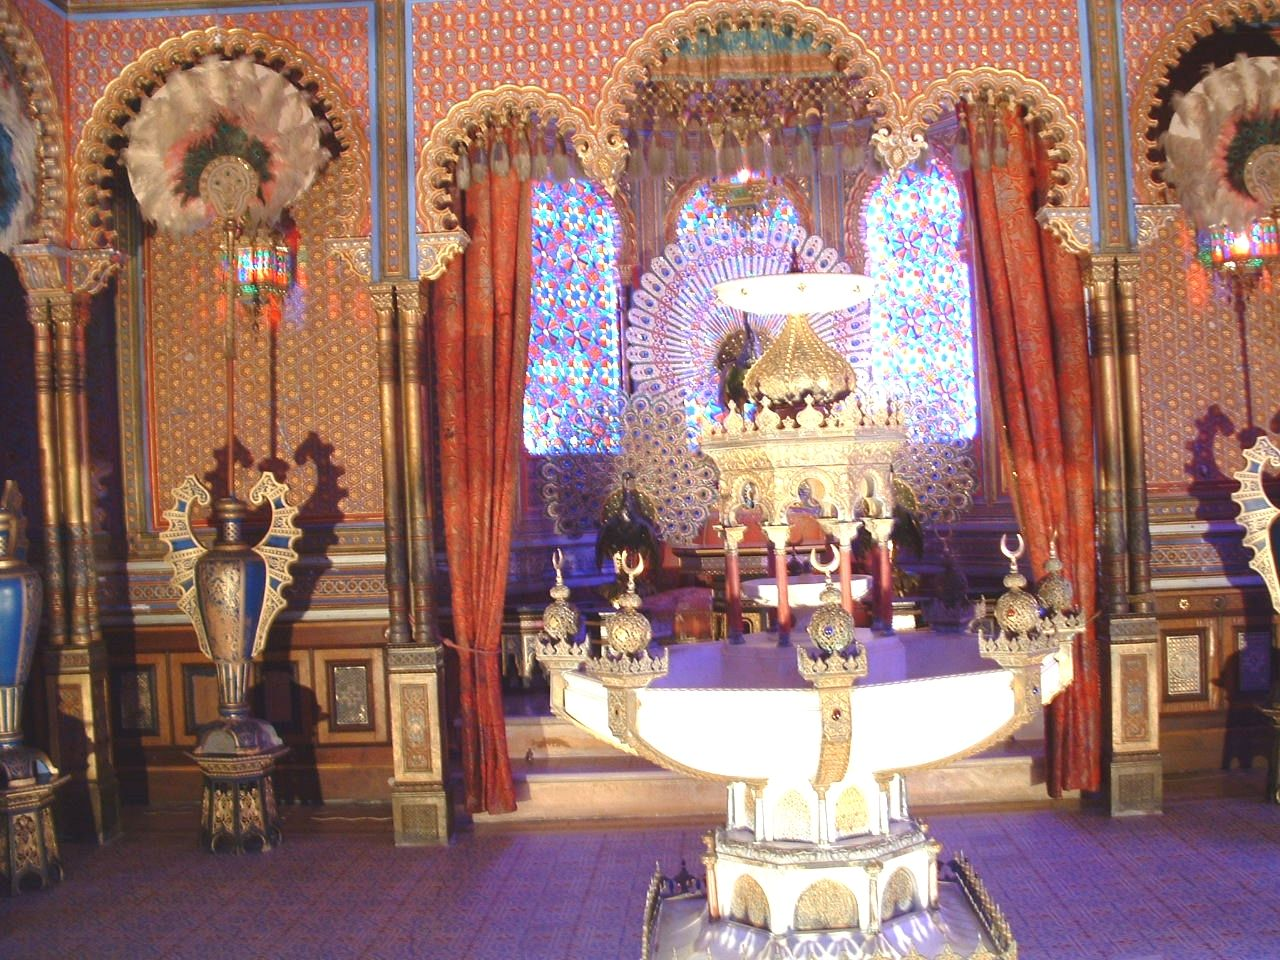 Marroqui 325 Marroqui Travellers Trip Marruecos ज नक र क ल ए स इट पर पह च Travelling Morrocos Linderhof Palace Moorish Beautiful Interiors